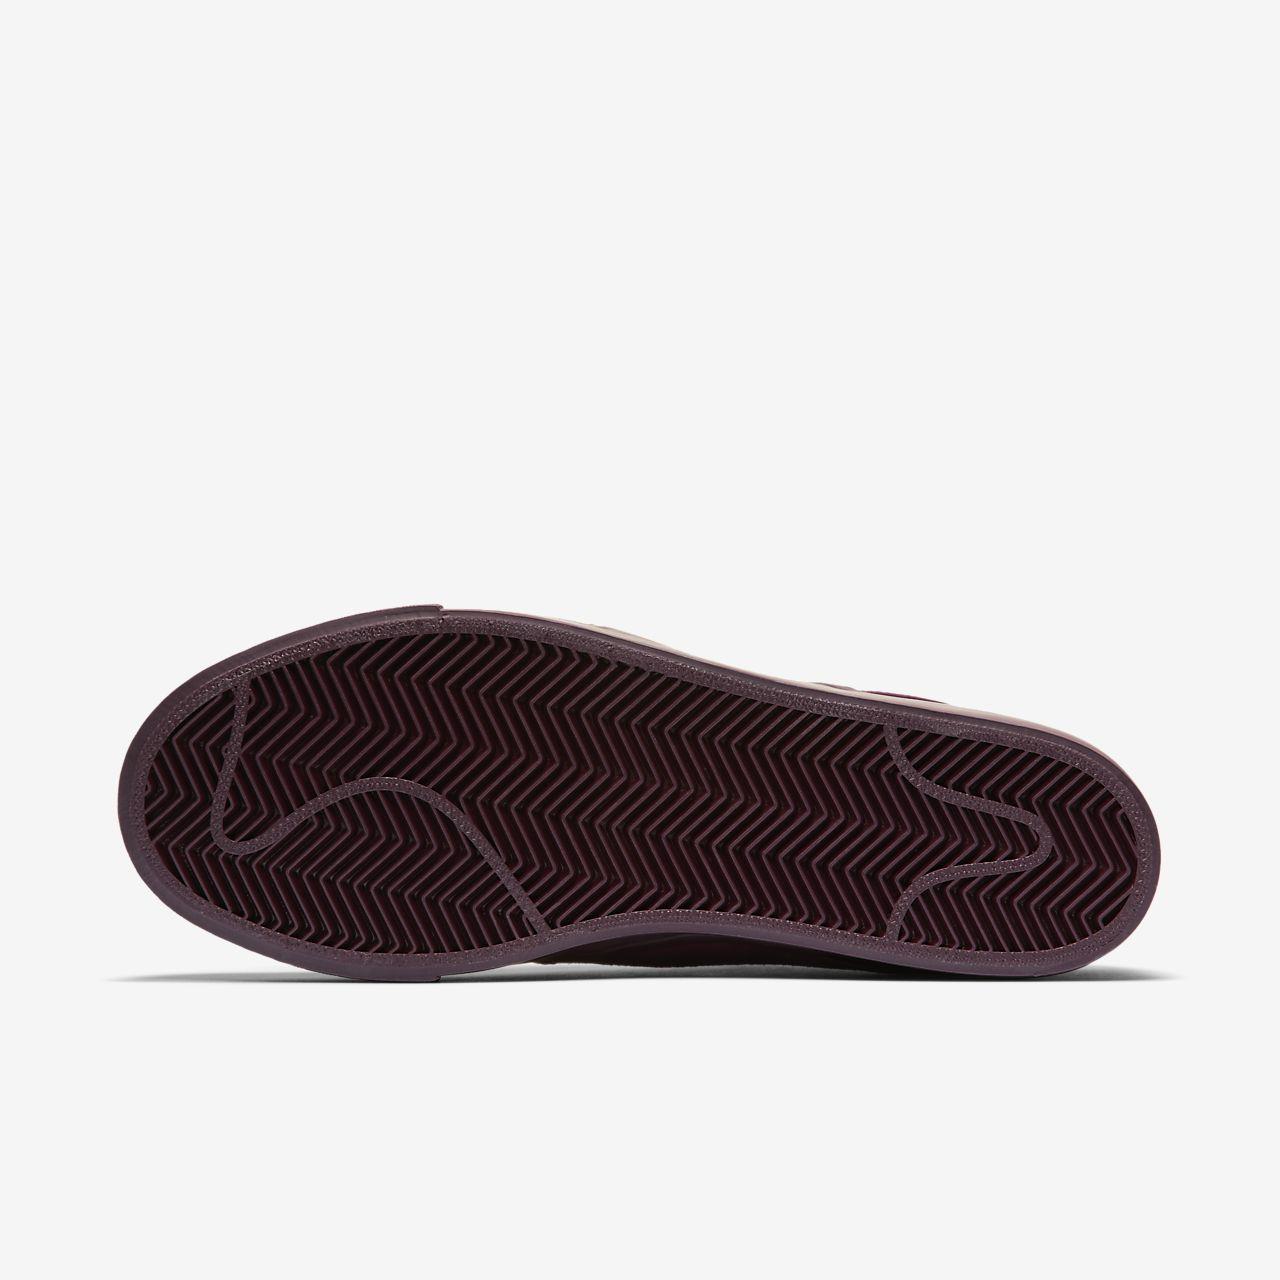 b38d043e4a4 Nike Zoom Stefan Janoski Men s Skate Shoe. Nike.com GB